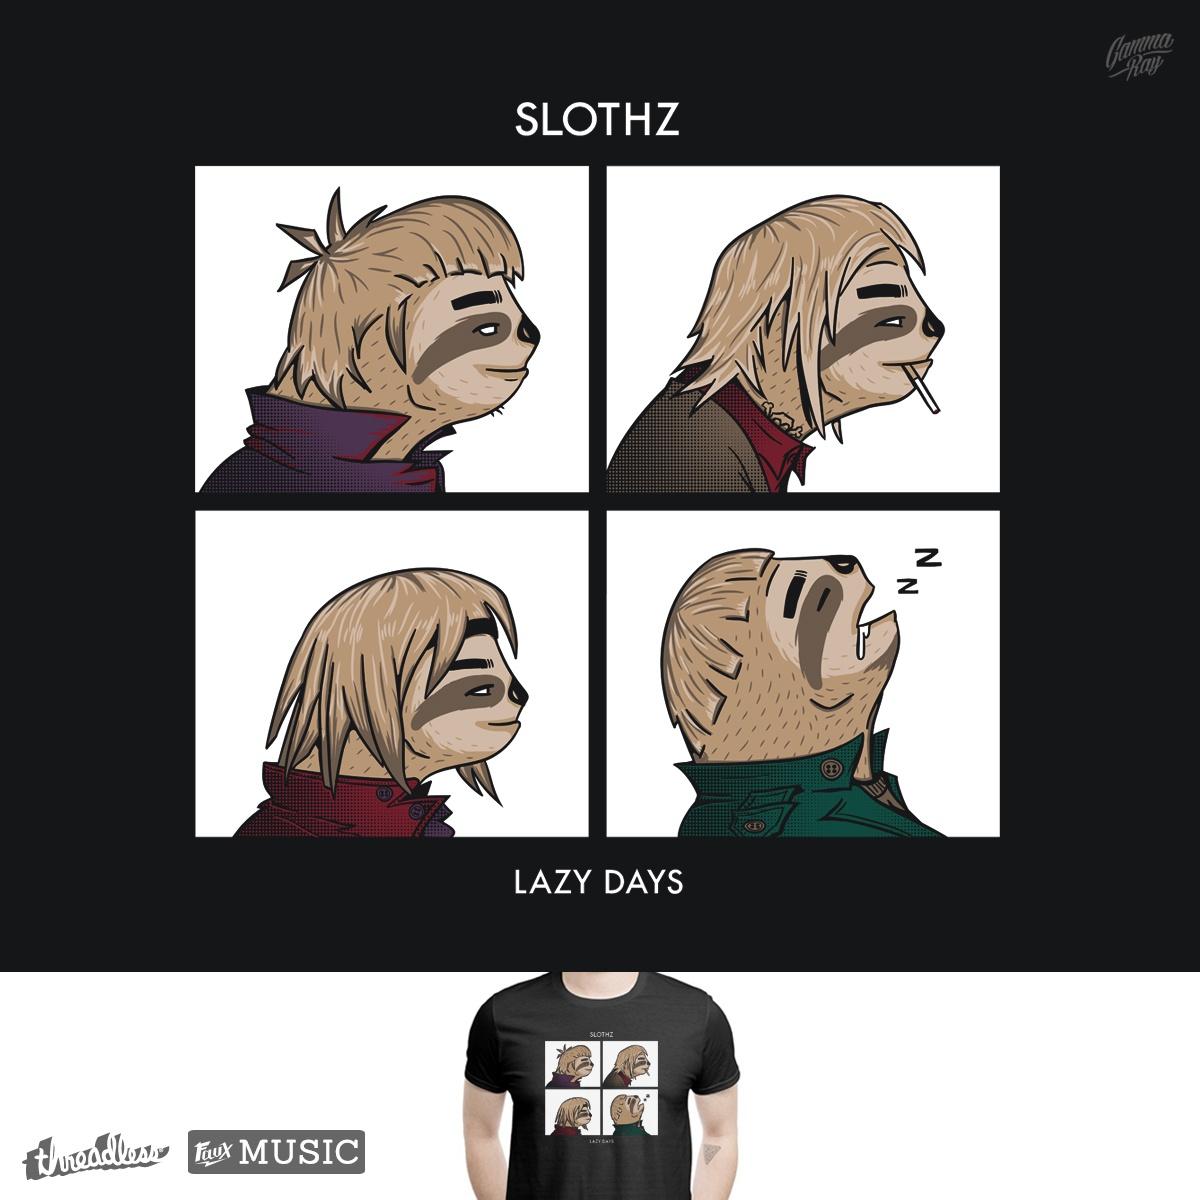 Slothz by Gamma-Ray on Threadless